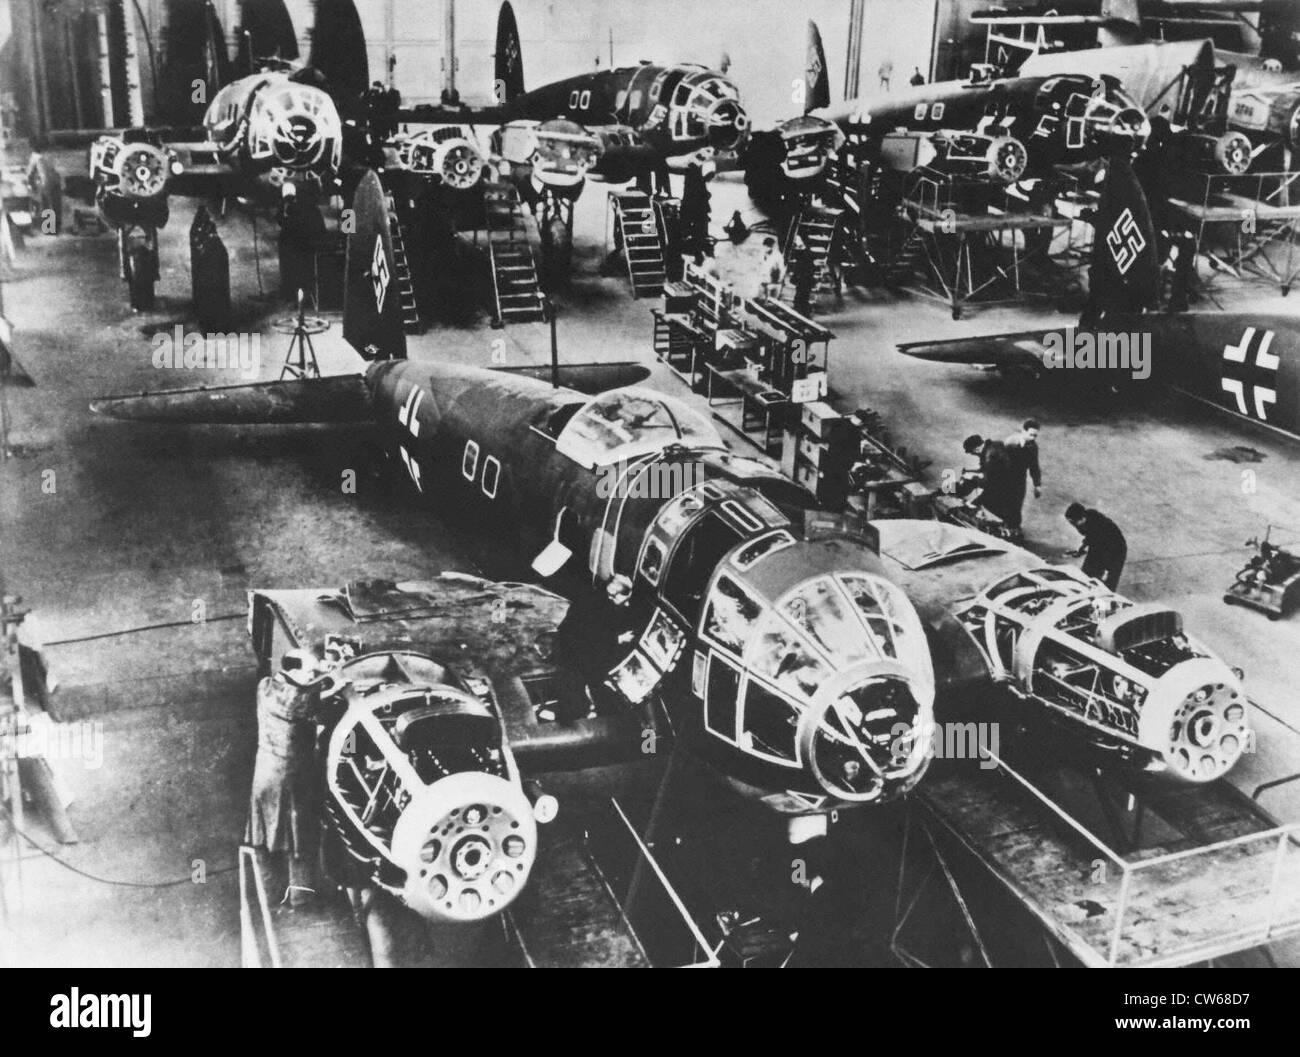 Aeronautics industry, Germany, World War II - Stock Image